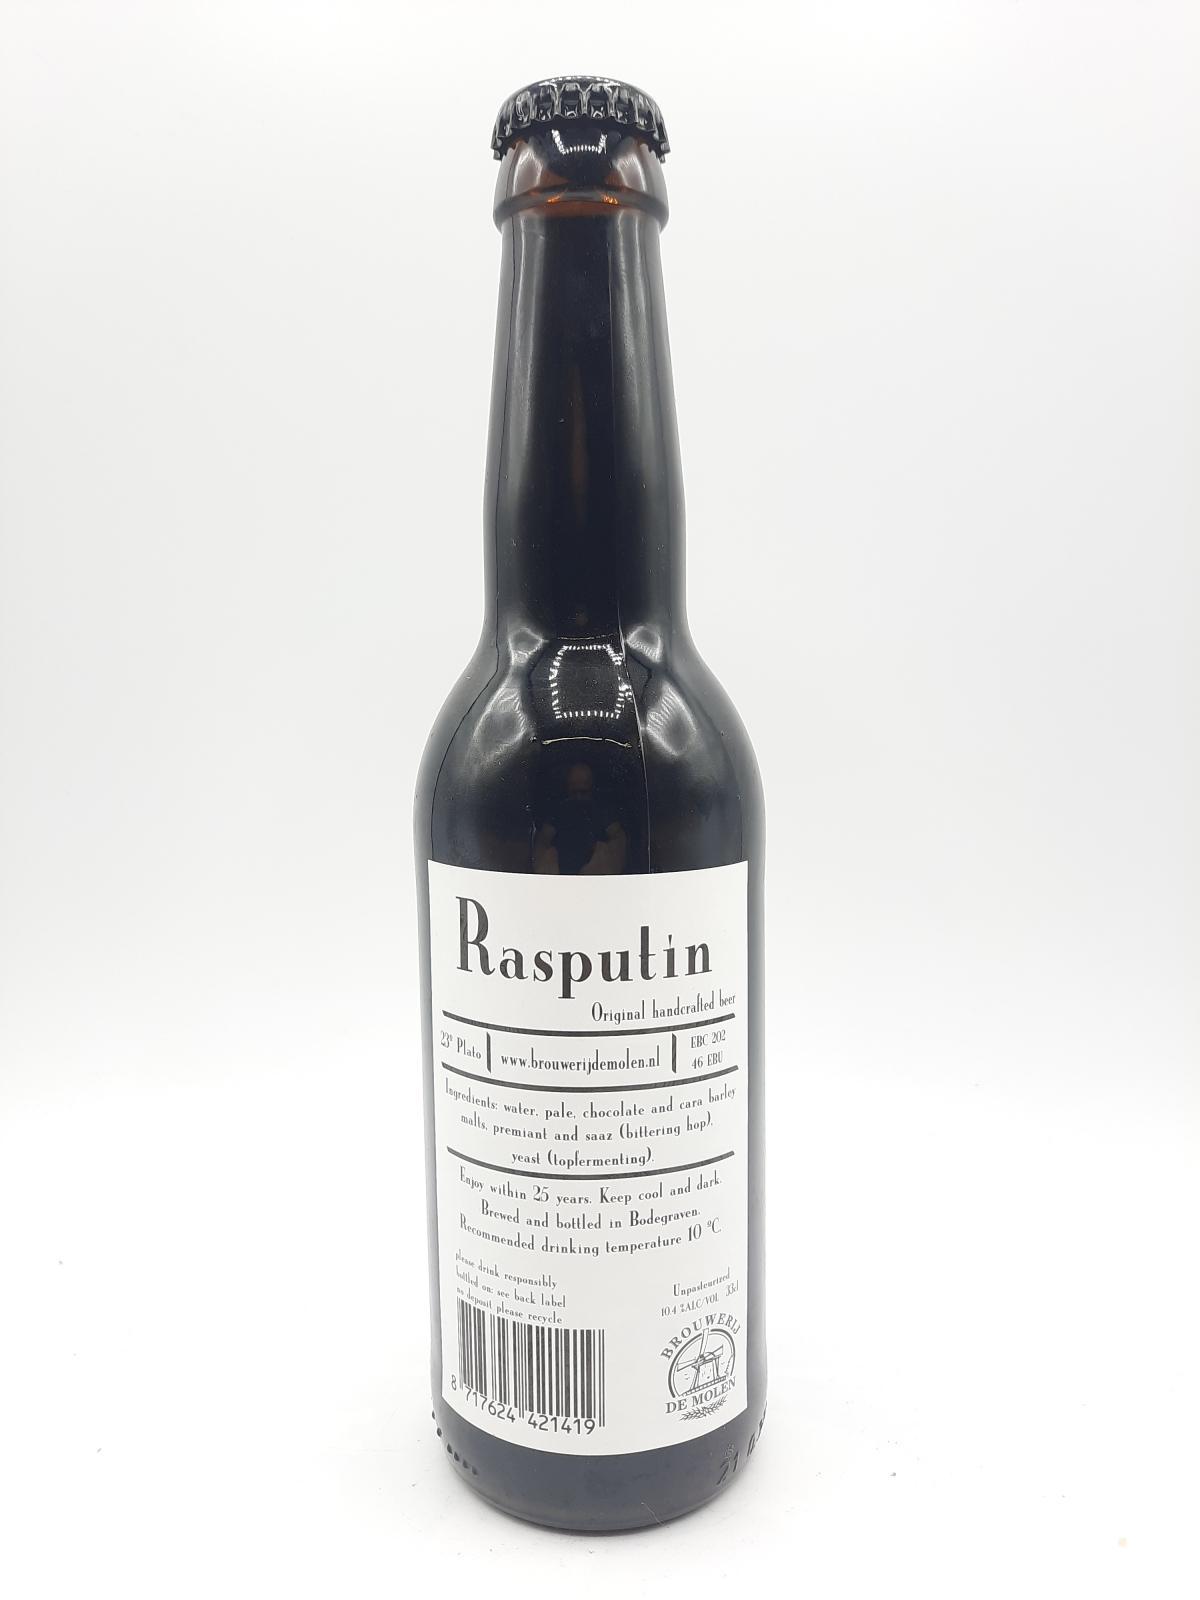 Image Rasputin 2014